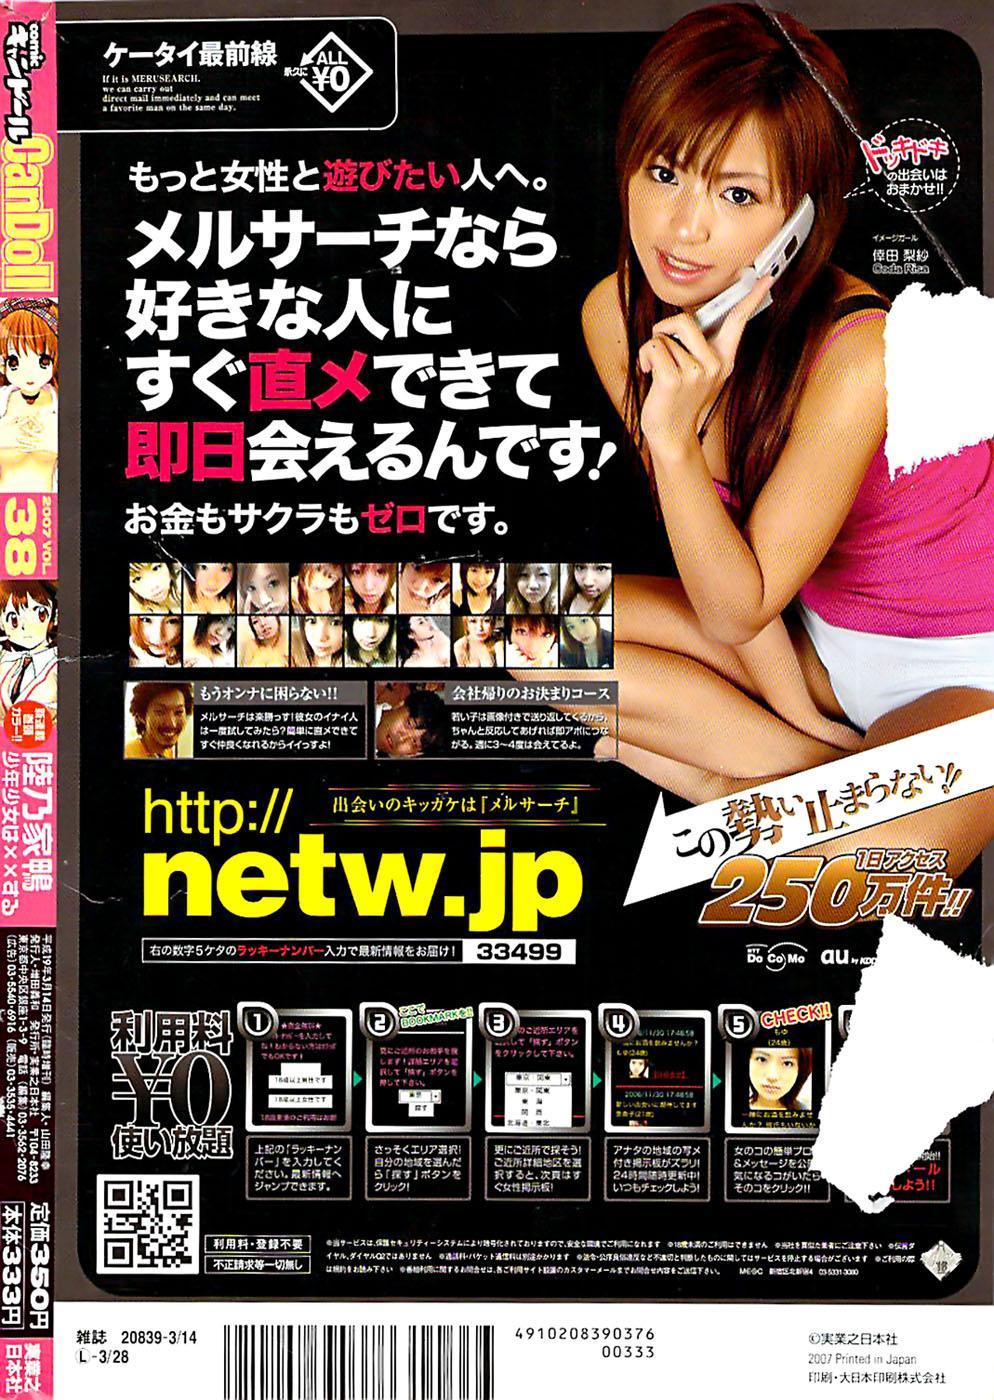 COMIC CanDoll 2007-03 Vol. 38 271